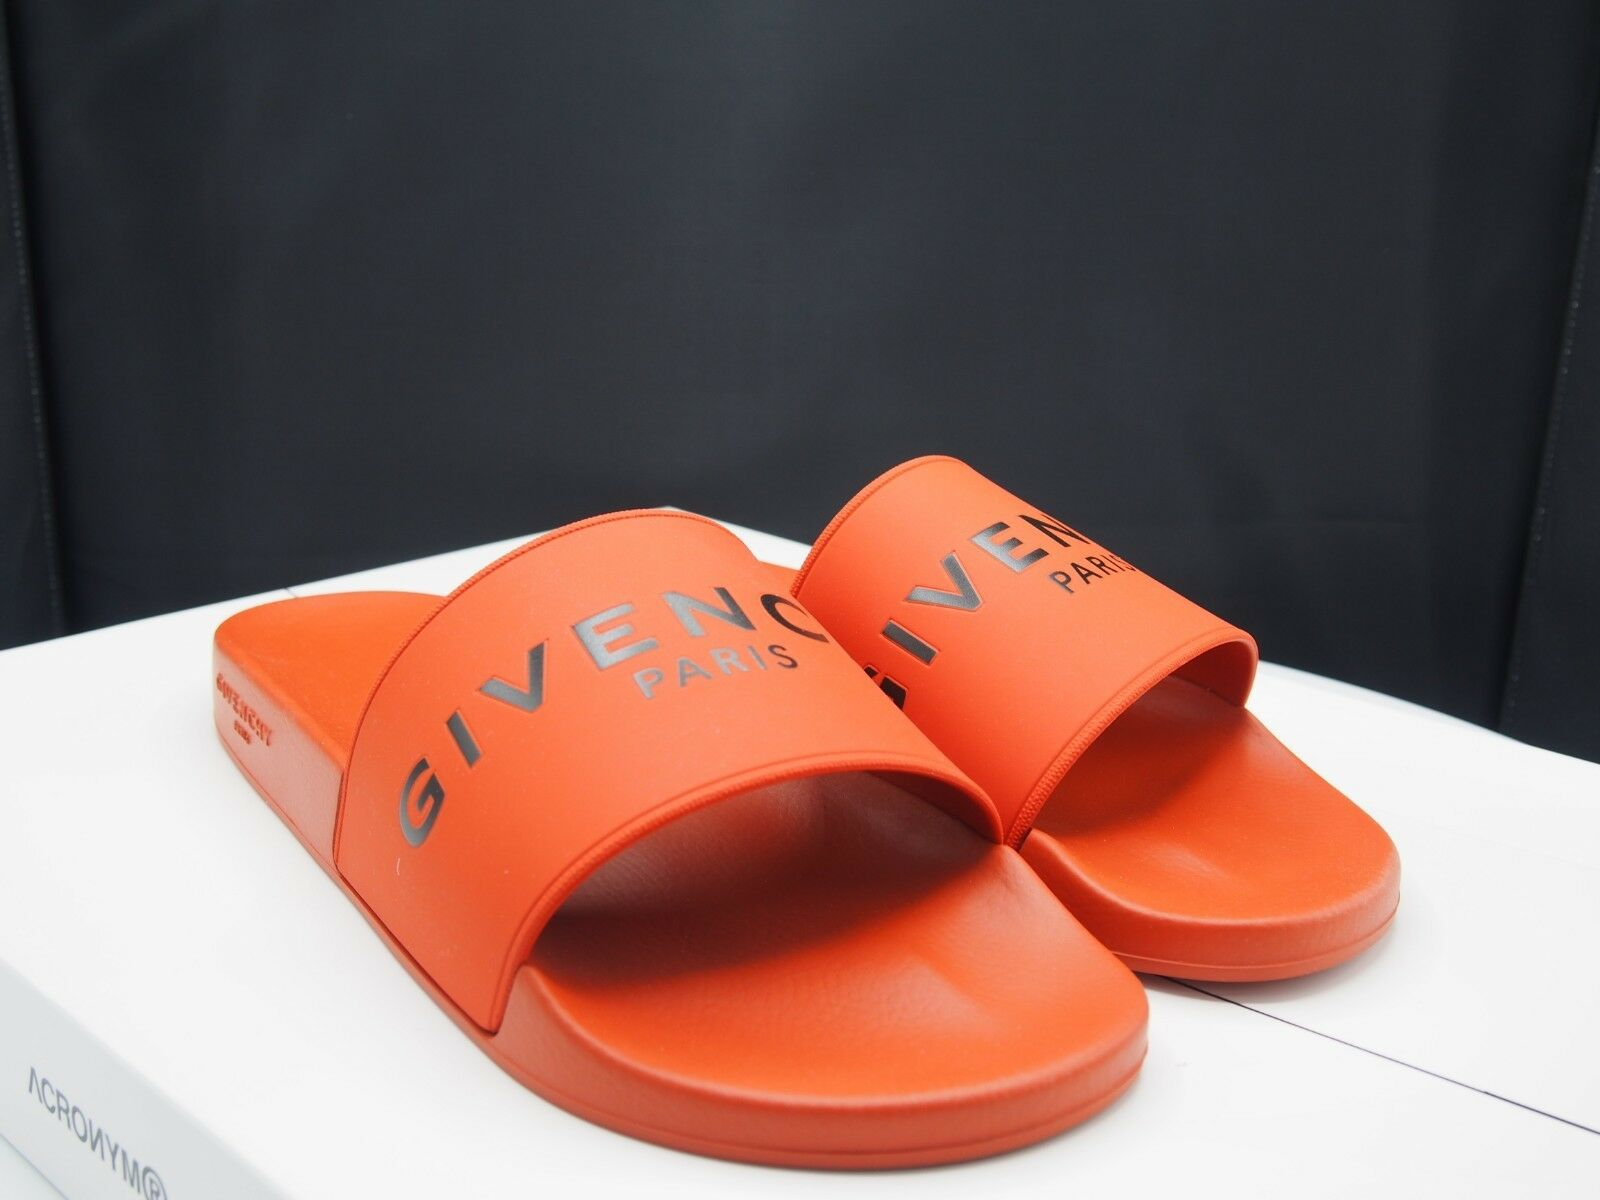 GIVENCHY Men's Slides Dark arancia Retail  295 Men's Dimensione 13 US